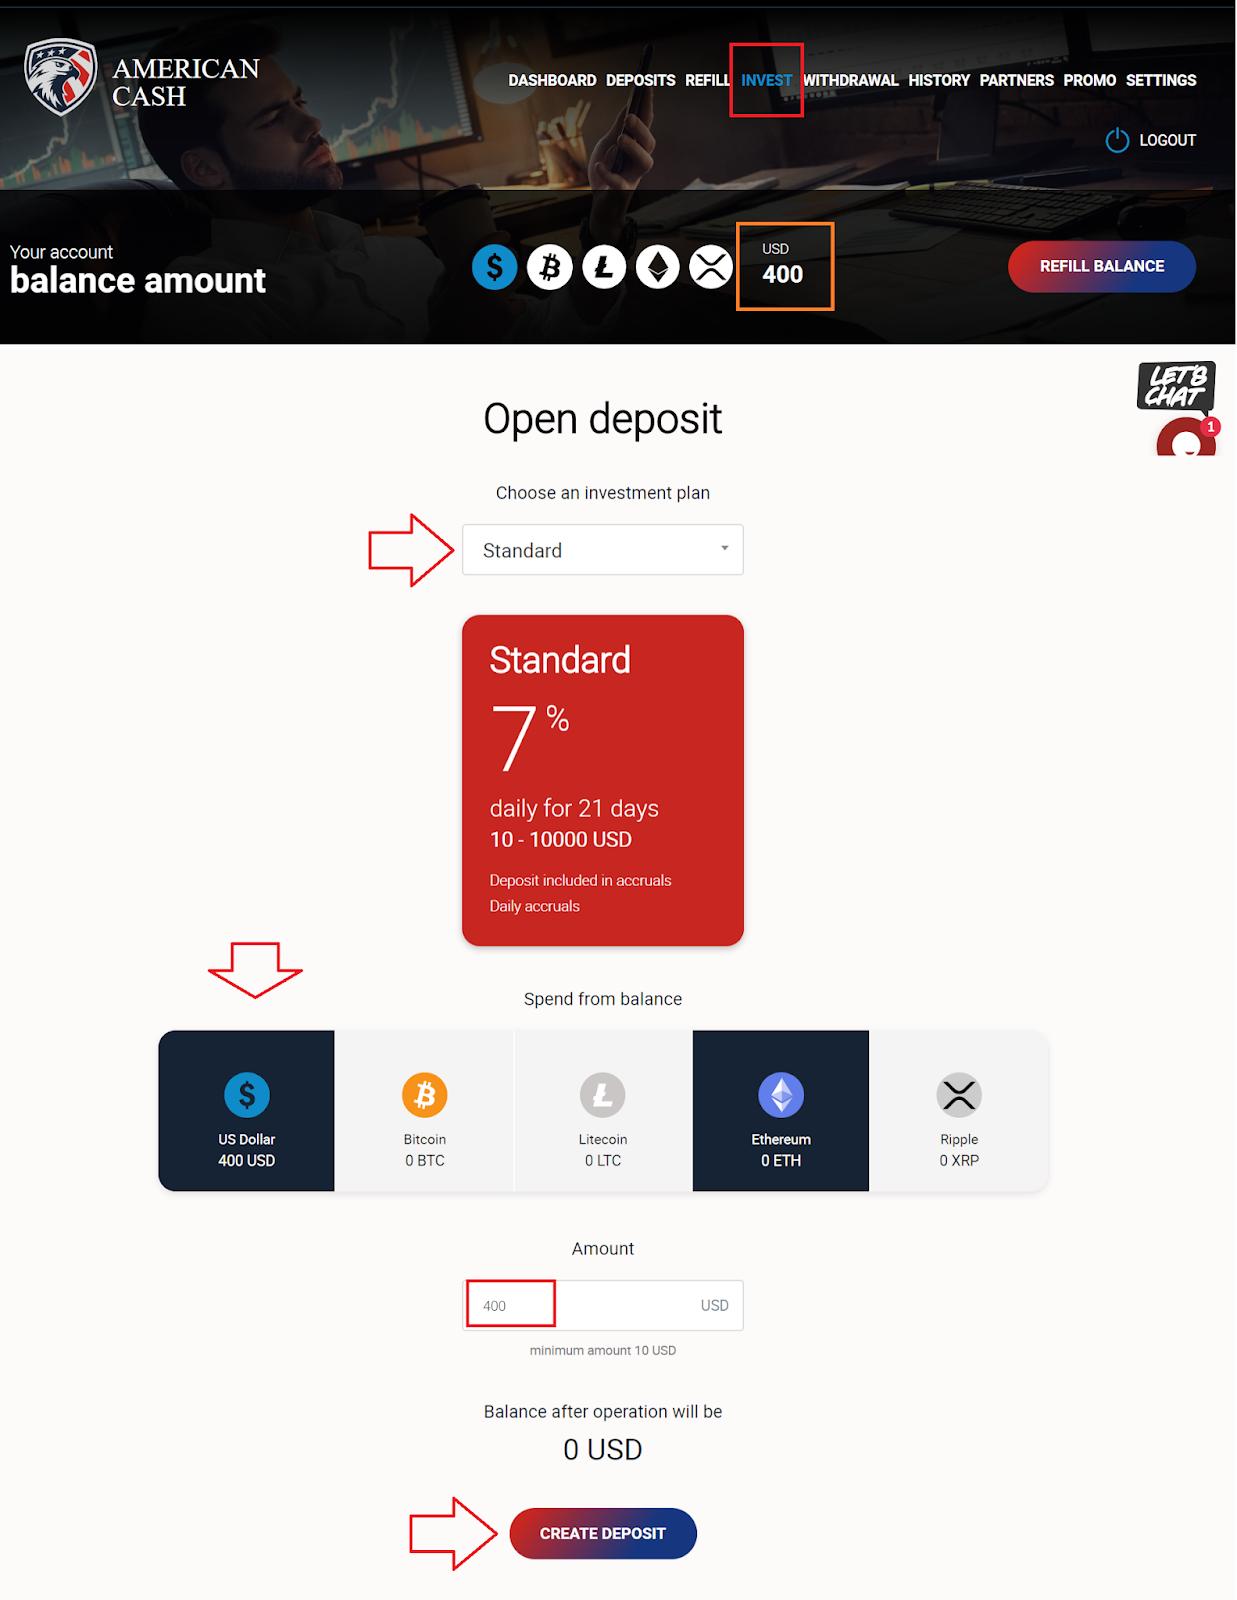 https://american.cash/?upline=hyipola